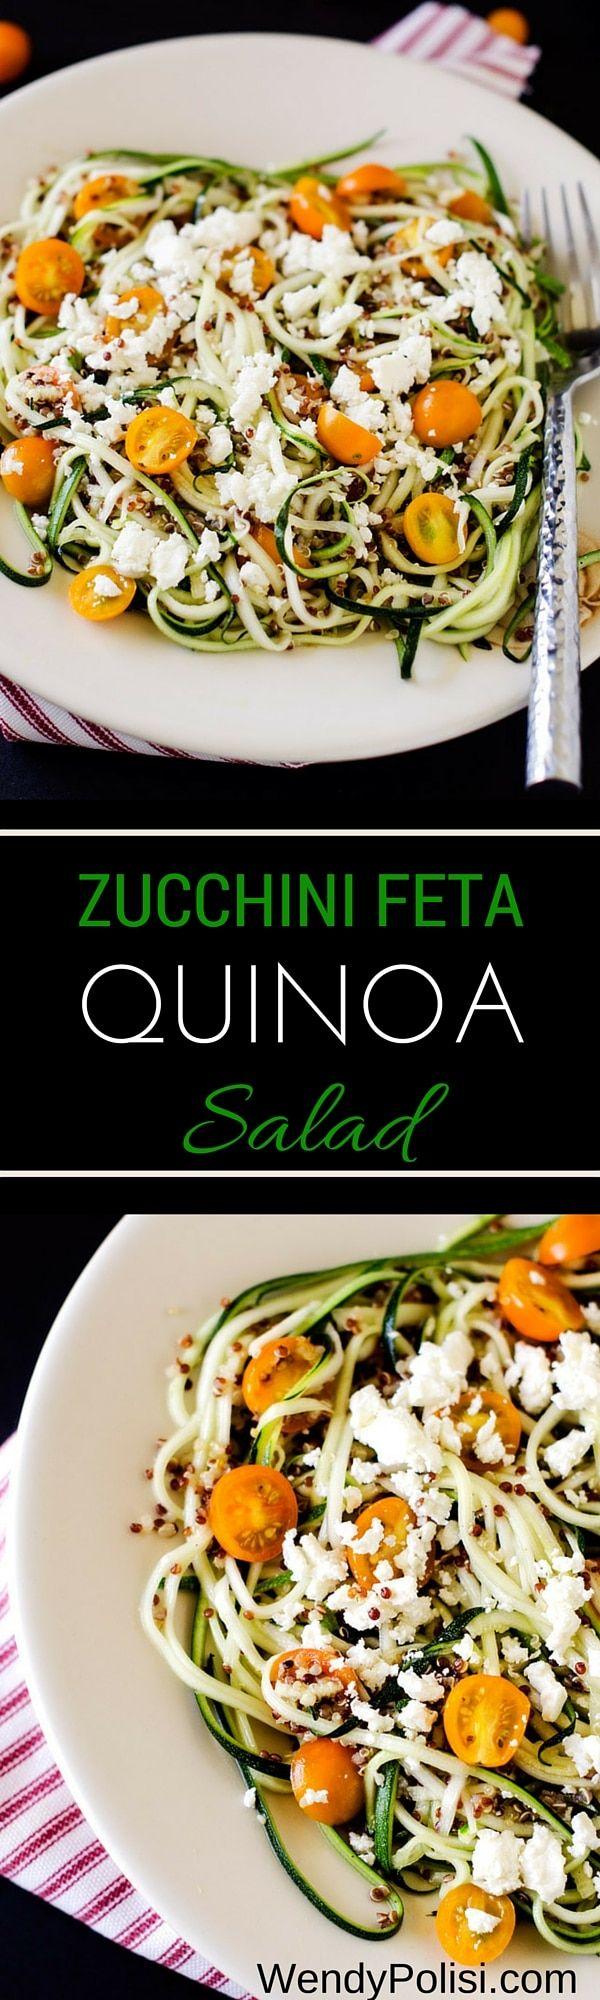 Zucchini Feta Quinoa Salad with Lemon Dill Dressing via @wendypolisi